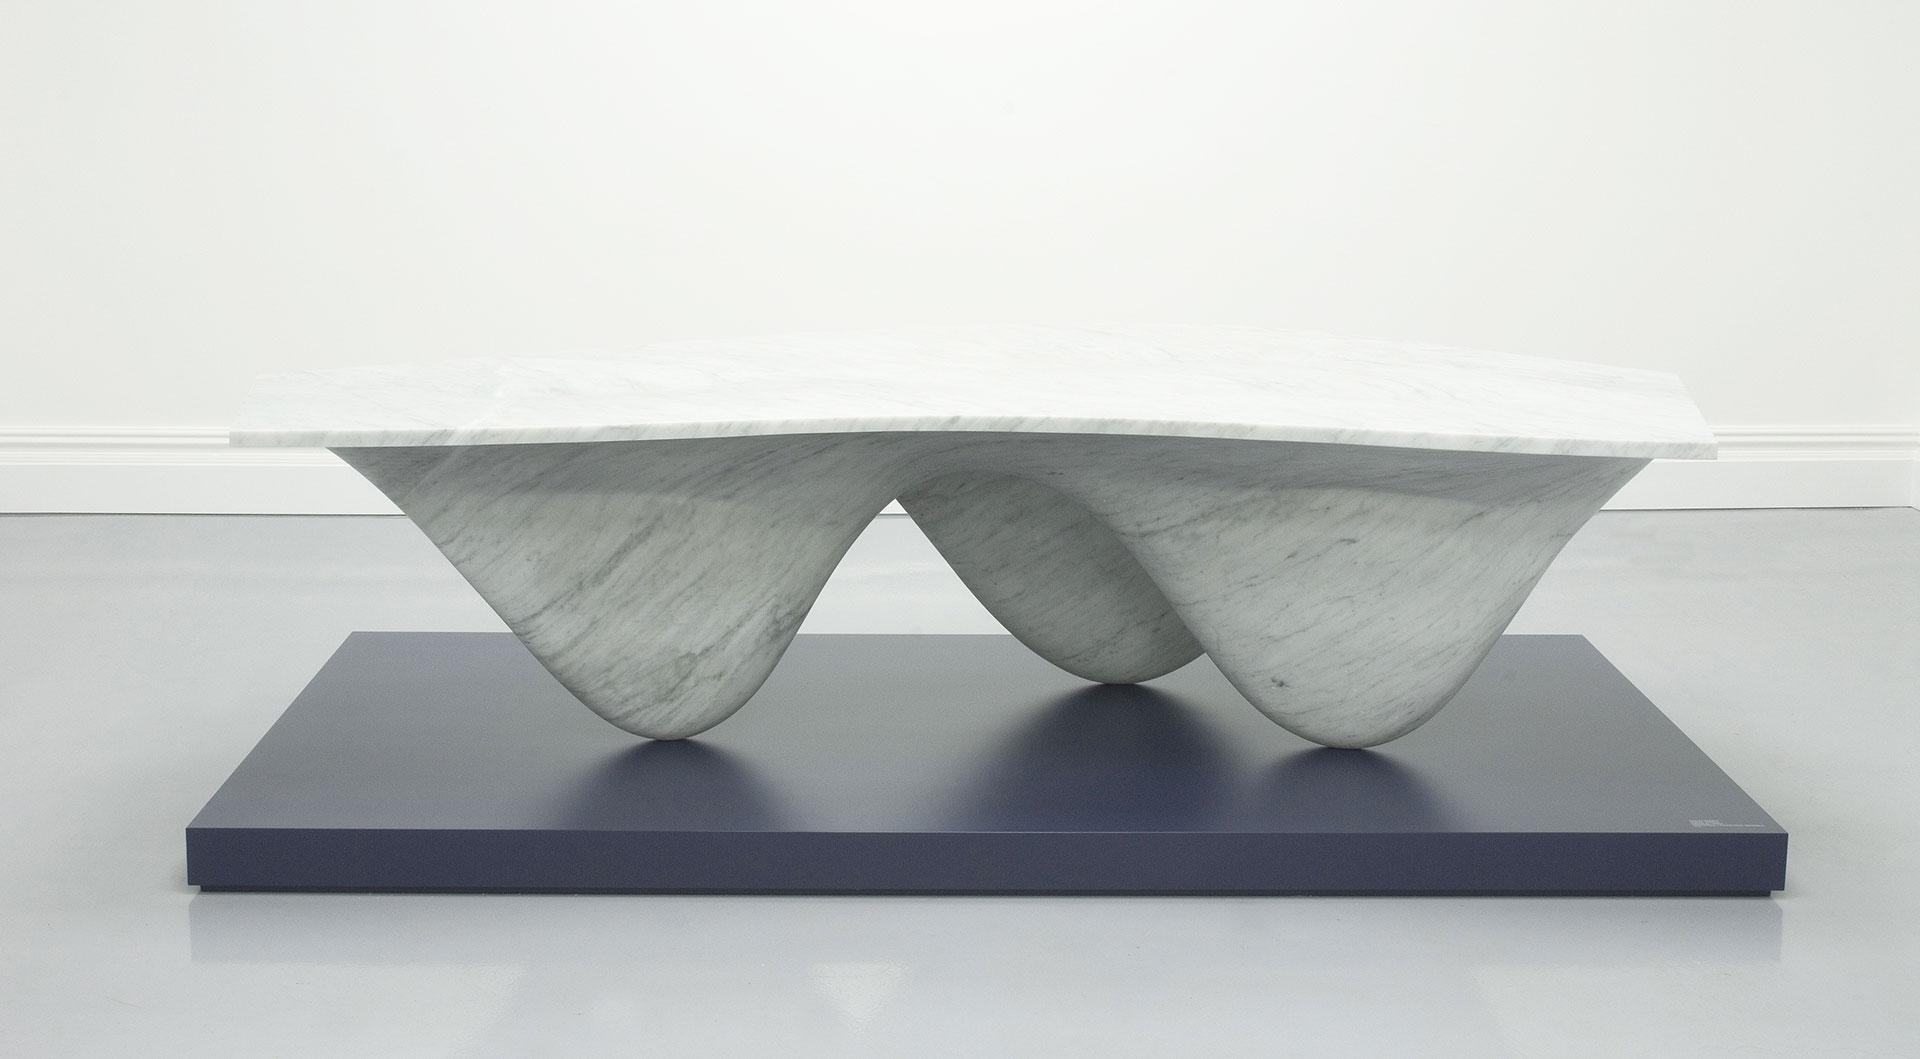 стол Захи Хадид фото